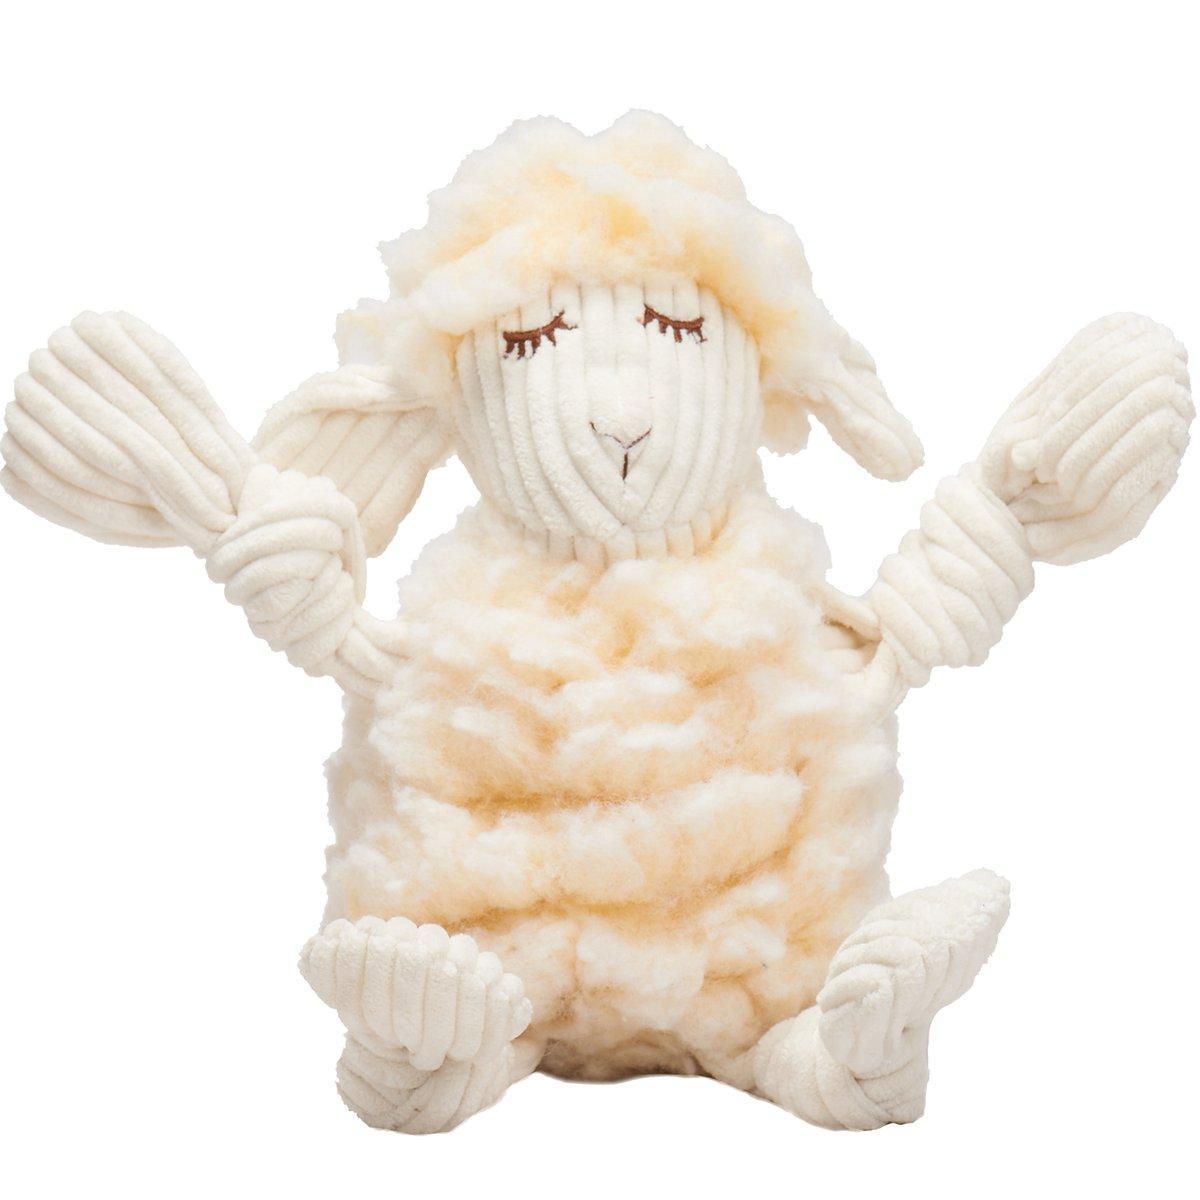 HuggleHounds HuggleFleece FlufferKnottie Louise the Lamb Dog Toy Image